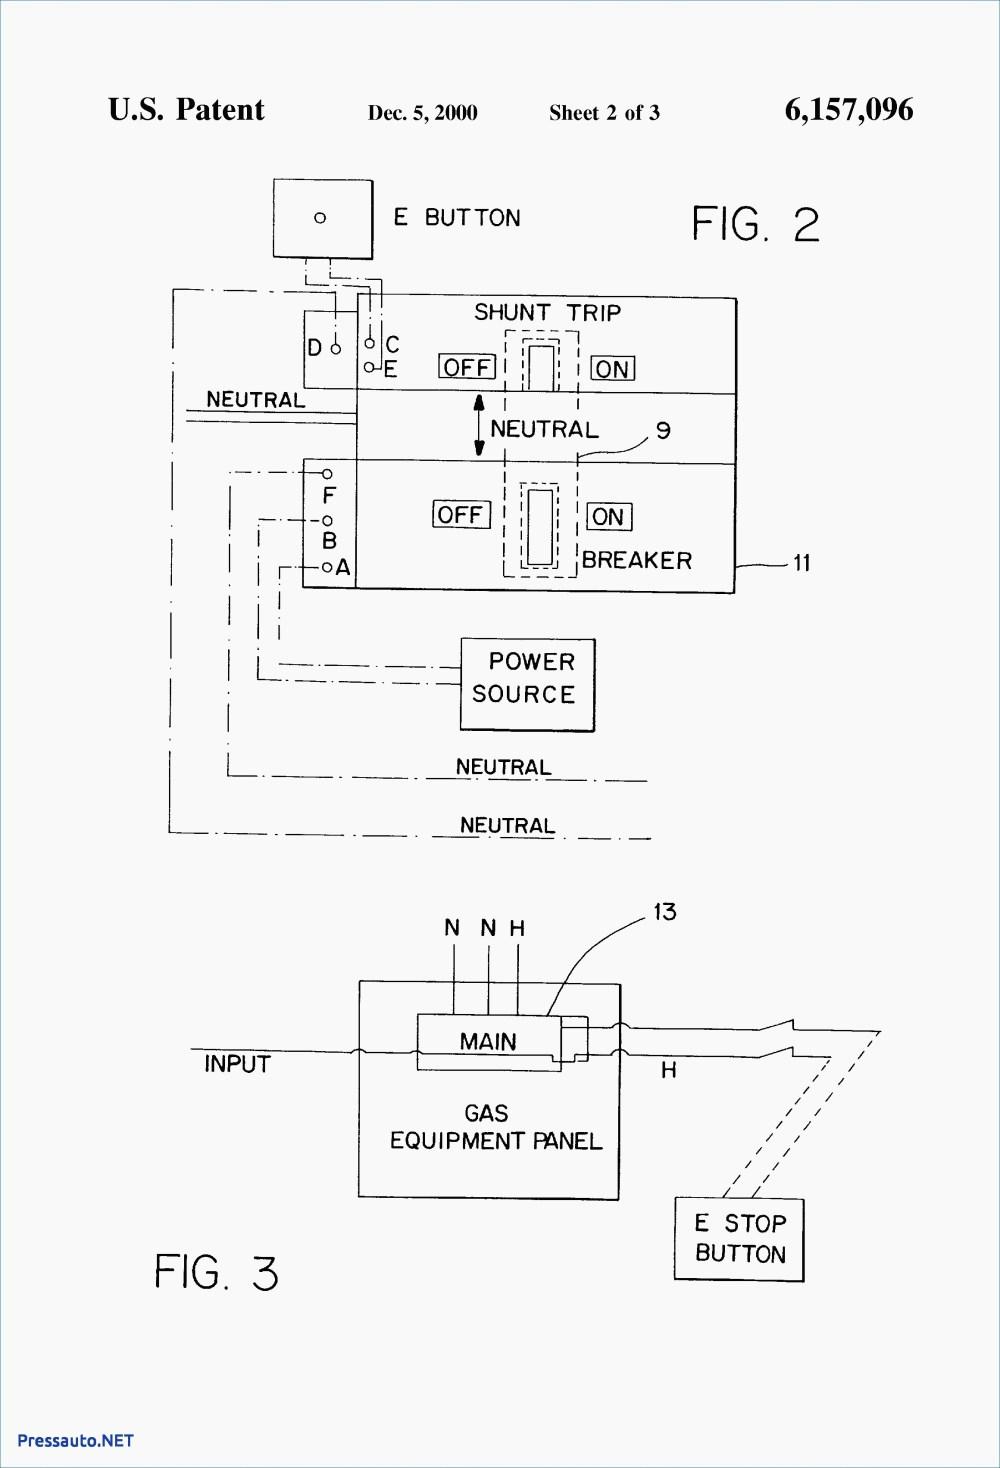 medium resolution of siemens shunt trip breaker wiring diagram siemens shunt trip breaker wiring diagram with square d